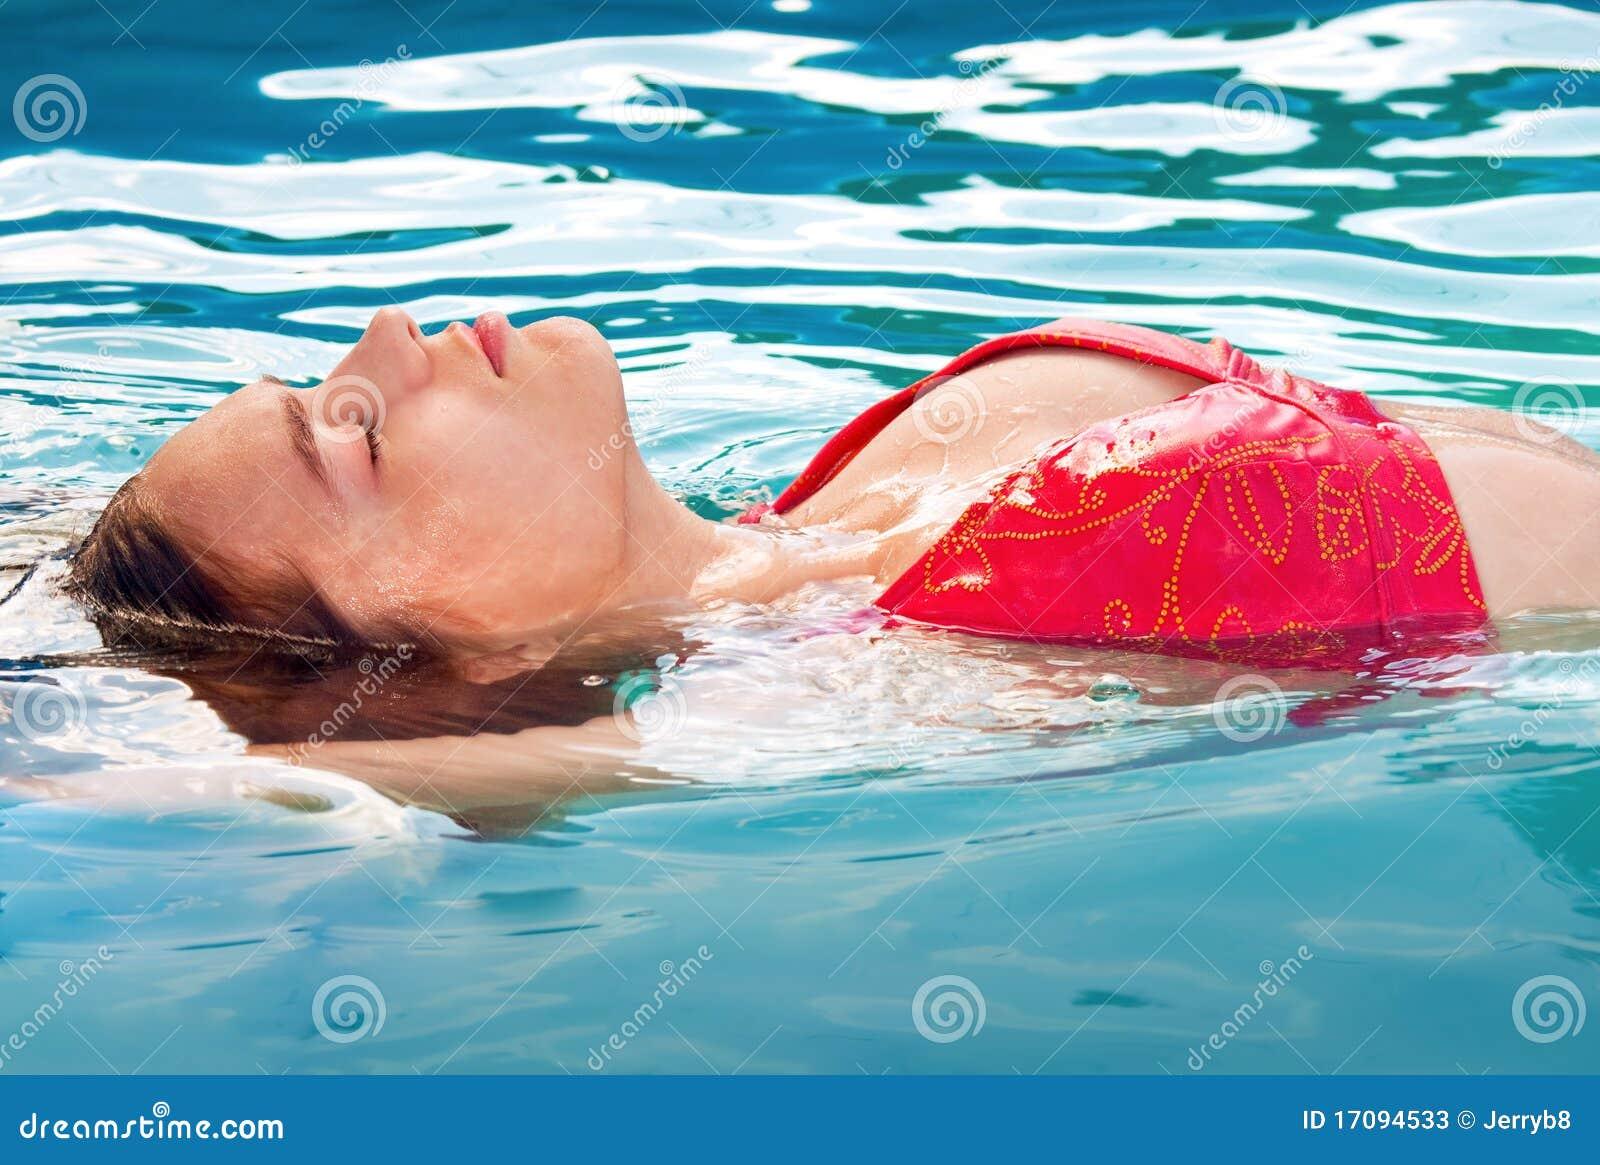 заплывание девушки